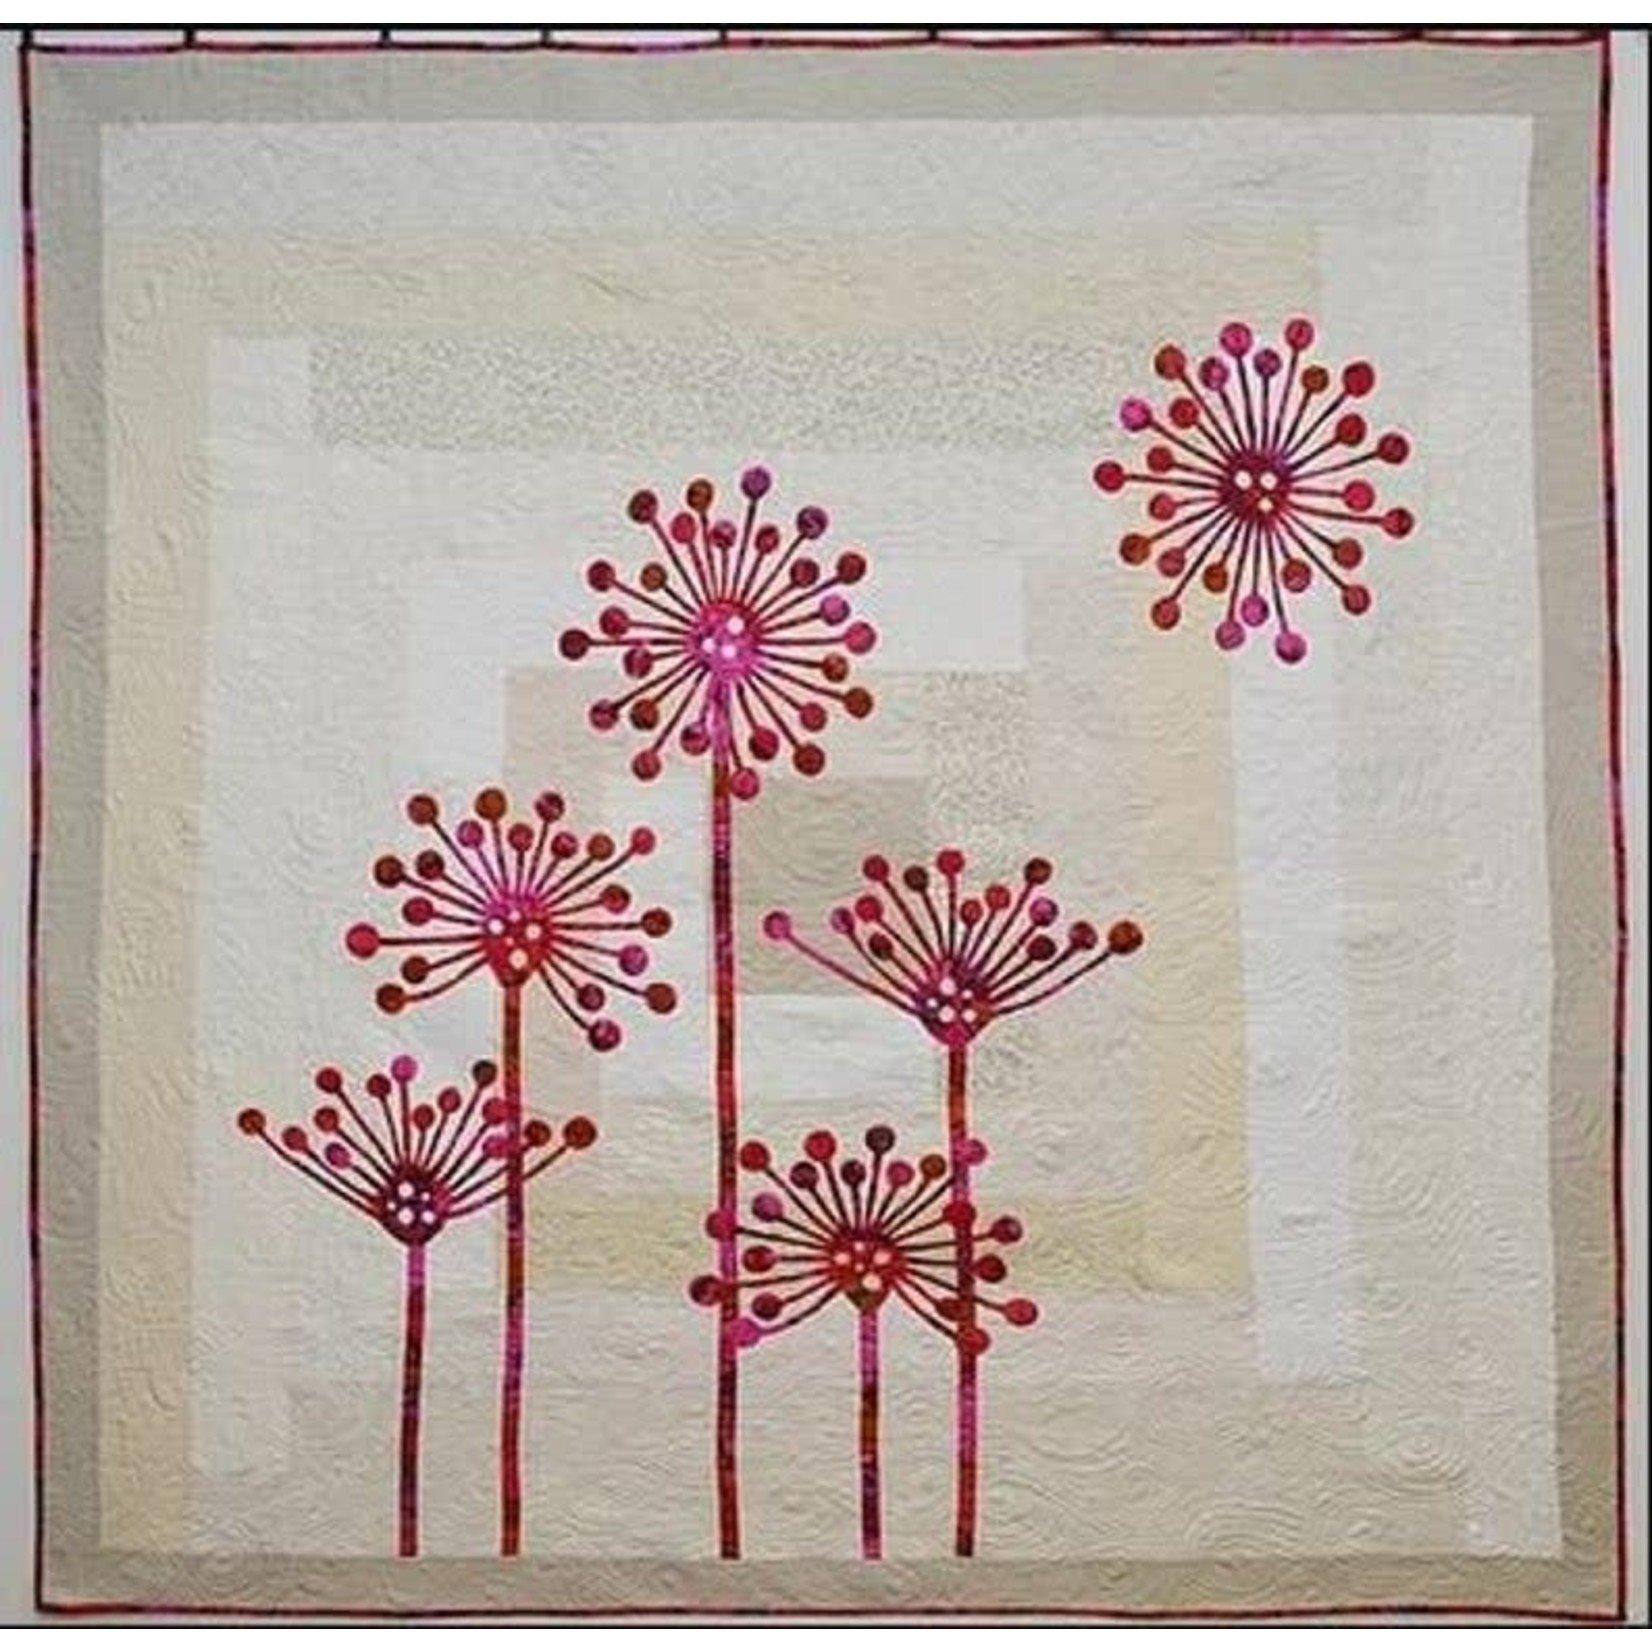 Passionately Sewn My Dandelion Wish Quilt Pattern